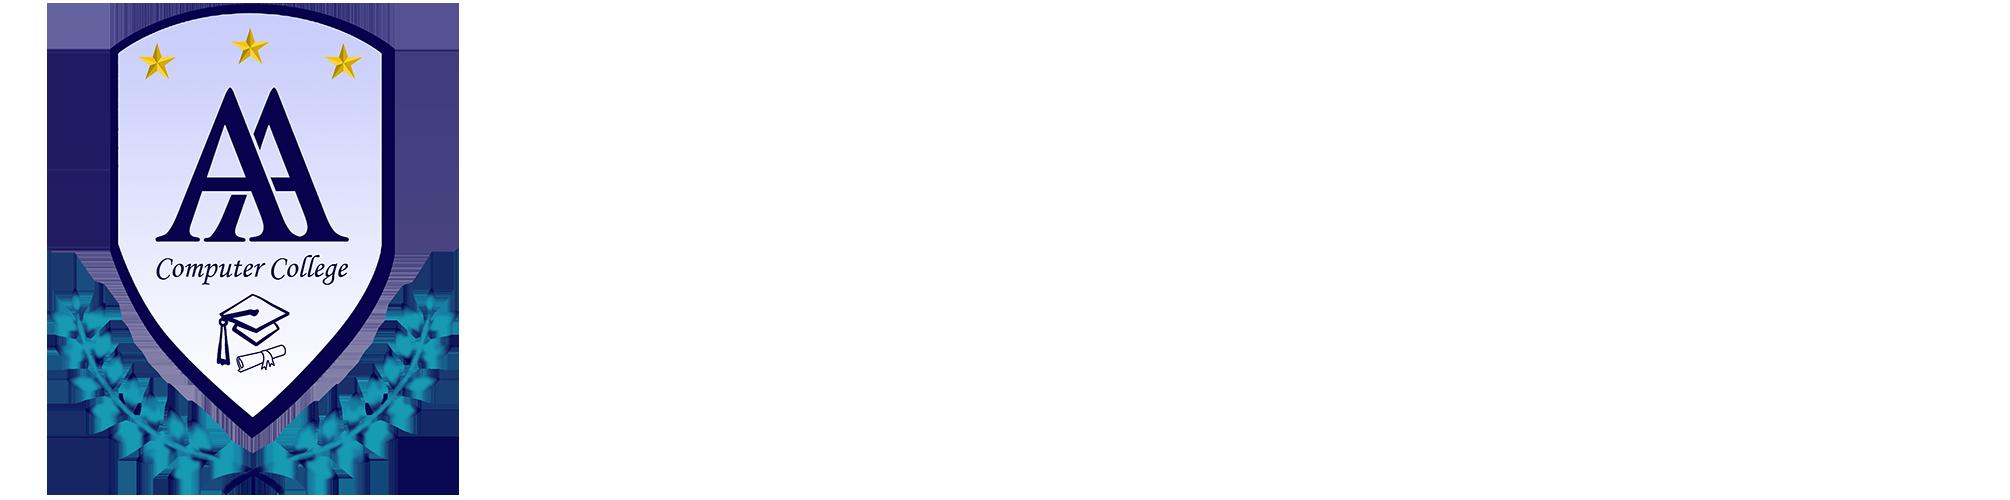 www.aacomputercollege.com